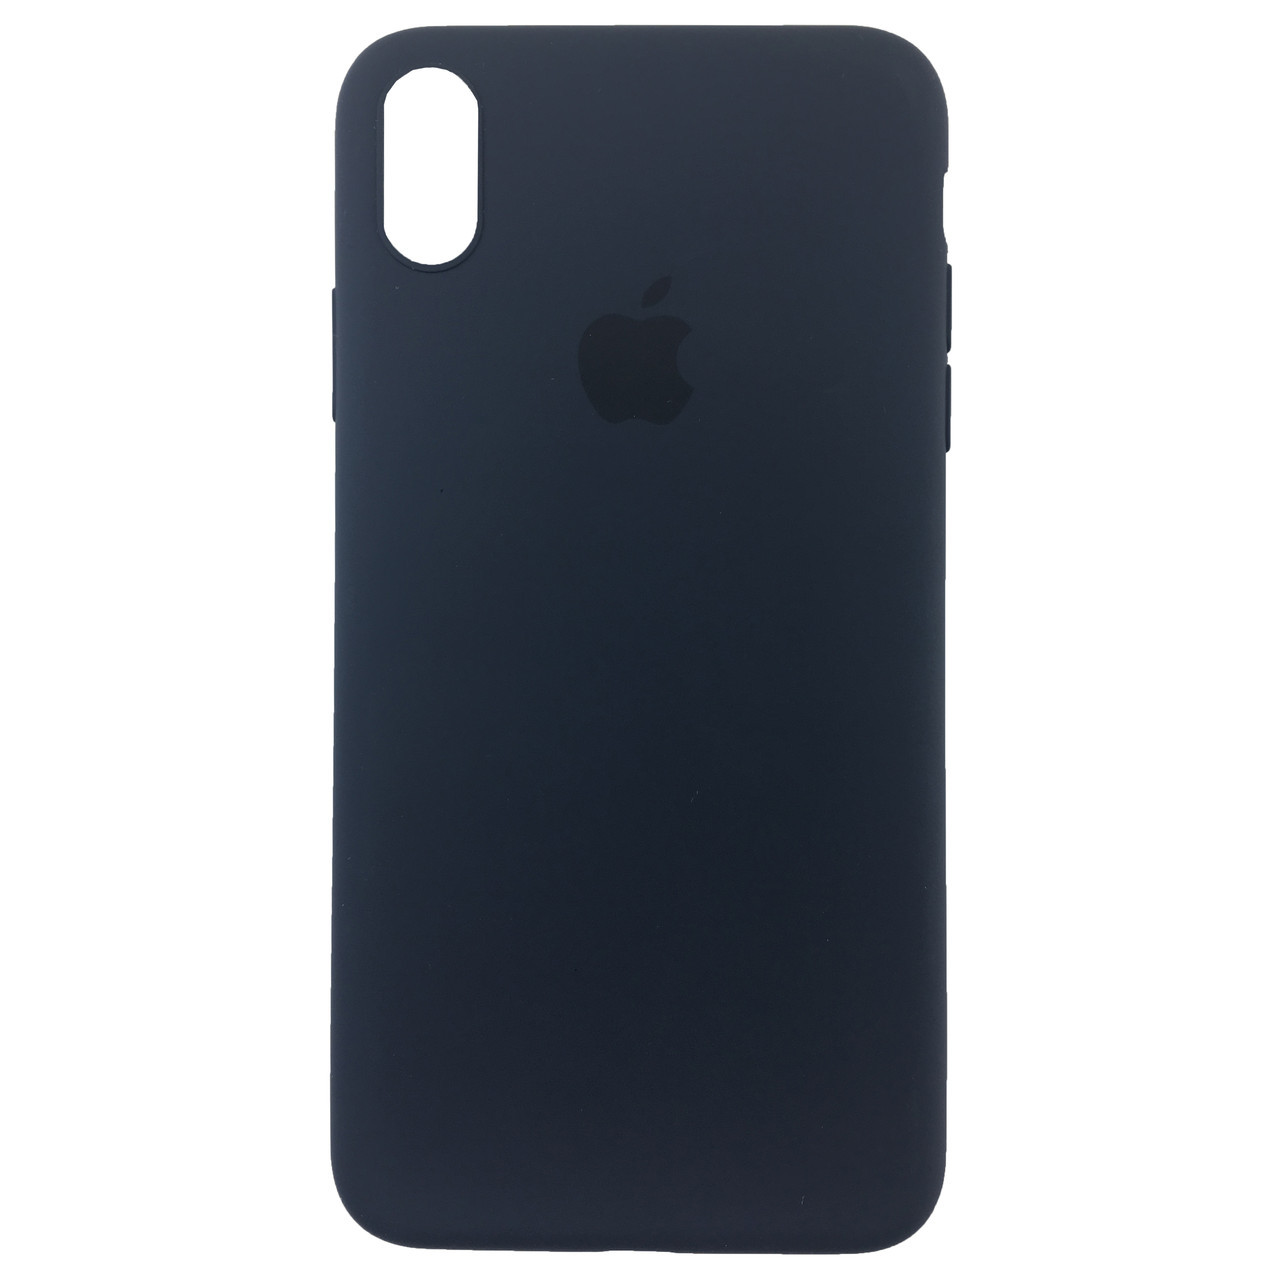 Чехол накладка xCase для iPhone XS Max Silicone Slim Case Midnight Blue